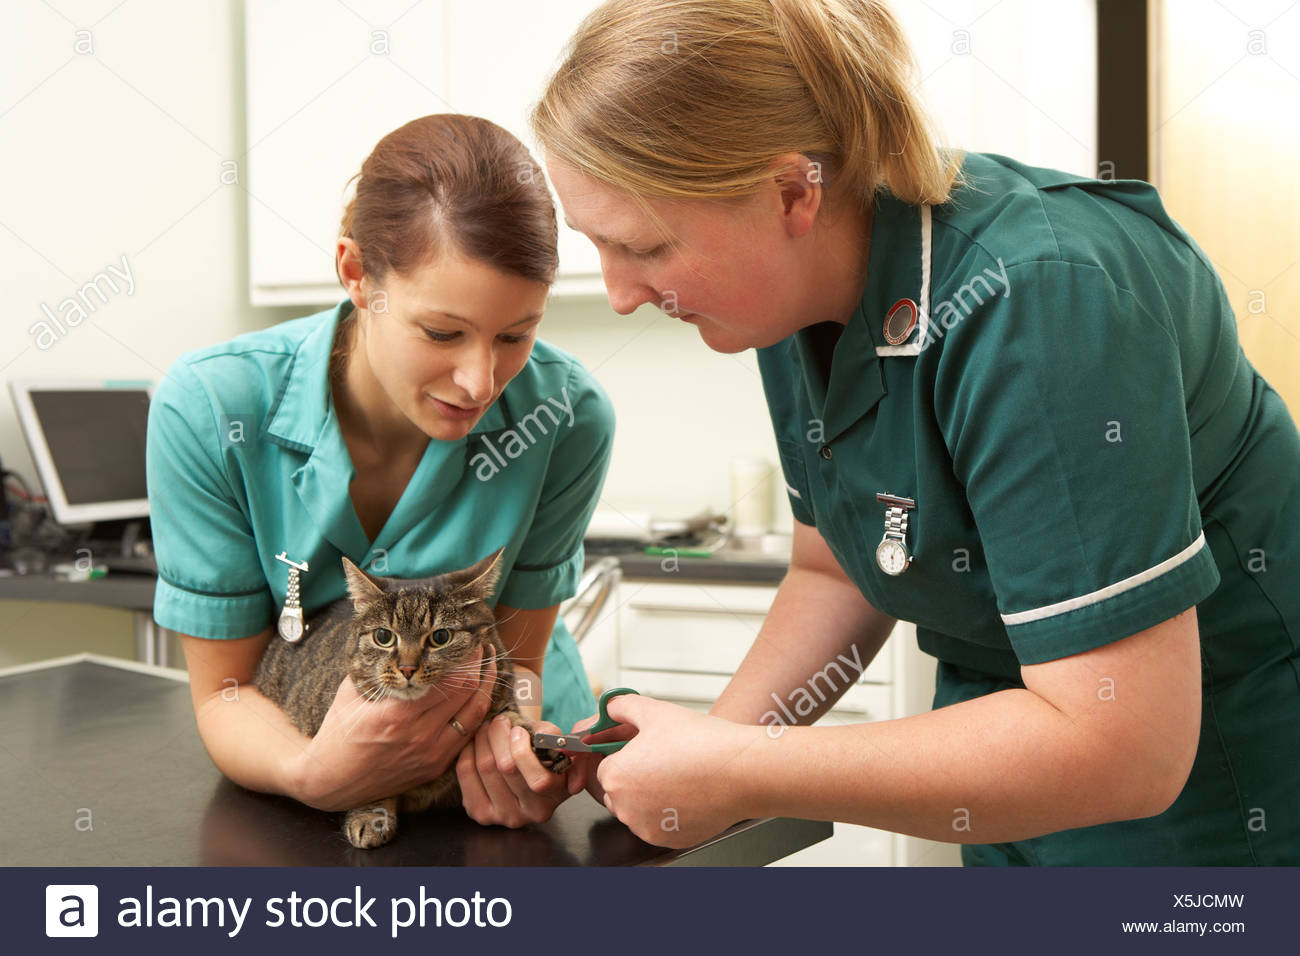 Female Veterinary Surgeon And Nurse Examining Cat In Surgery - Stock Image